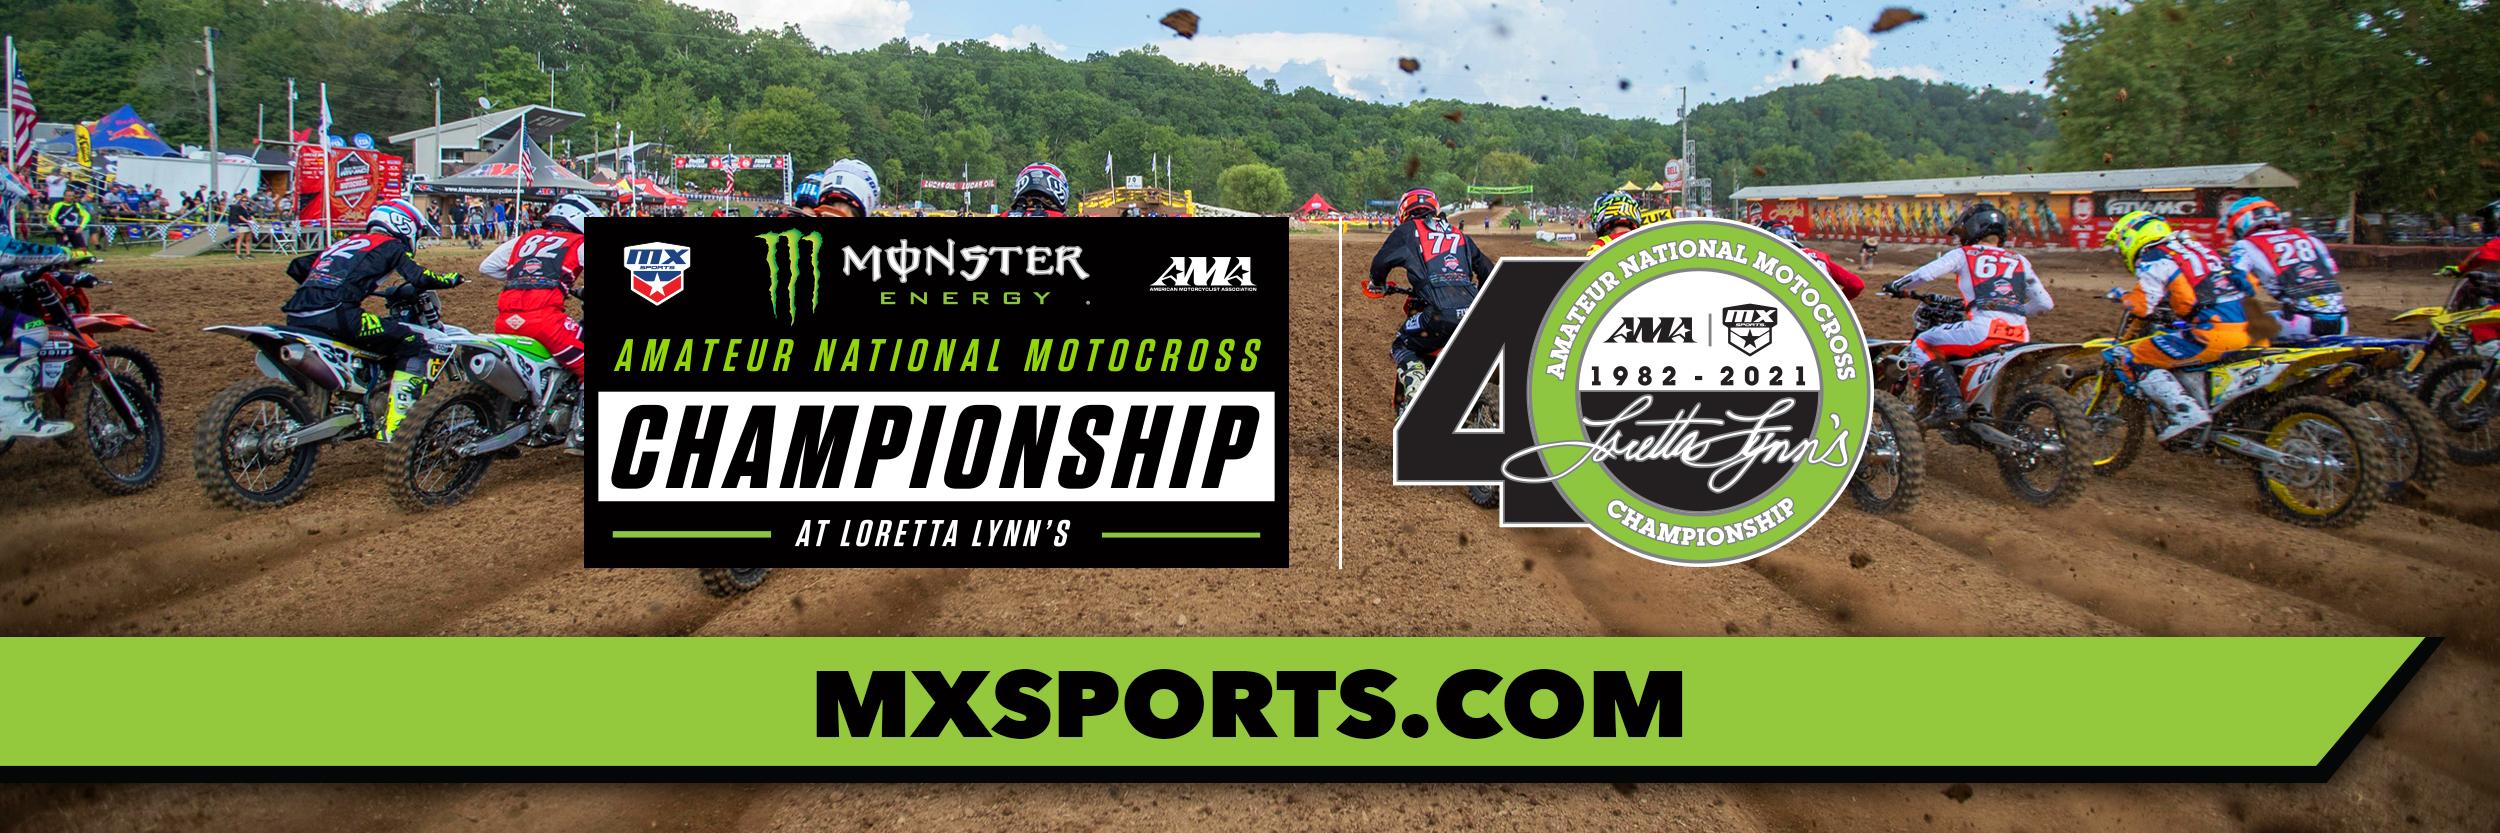 2021 Amateur National Motocross Championship banner